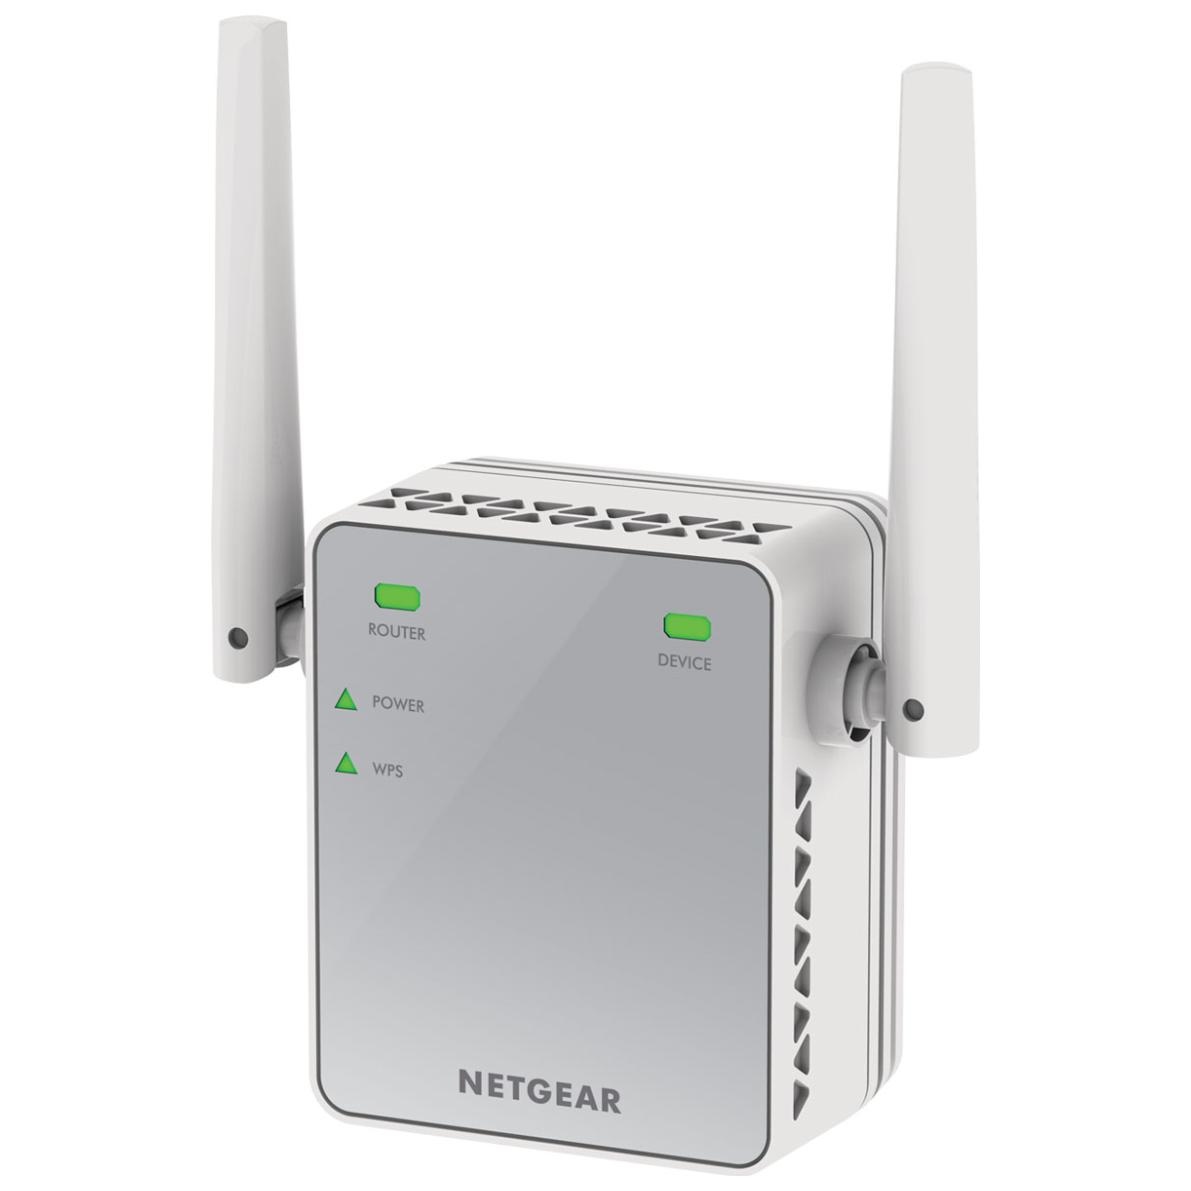 Netgear EX3700 AC750 Dual Band Wireless Range Extender - EX3700-100AUS - PLE Computers ...